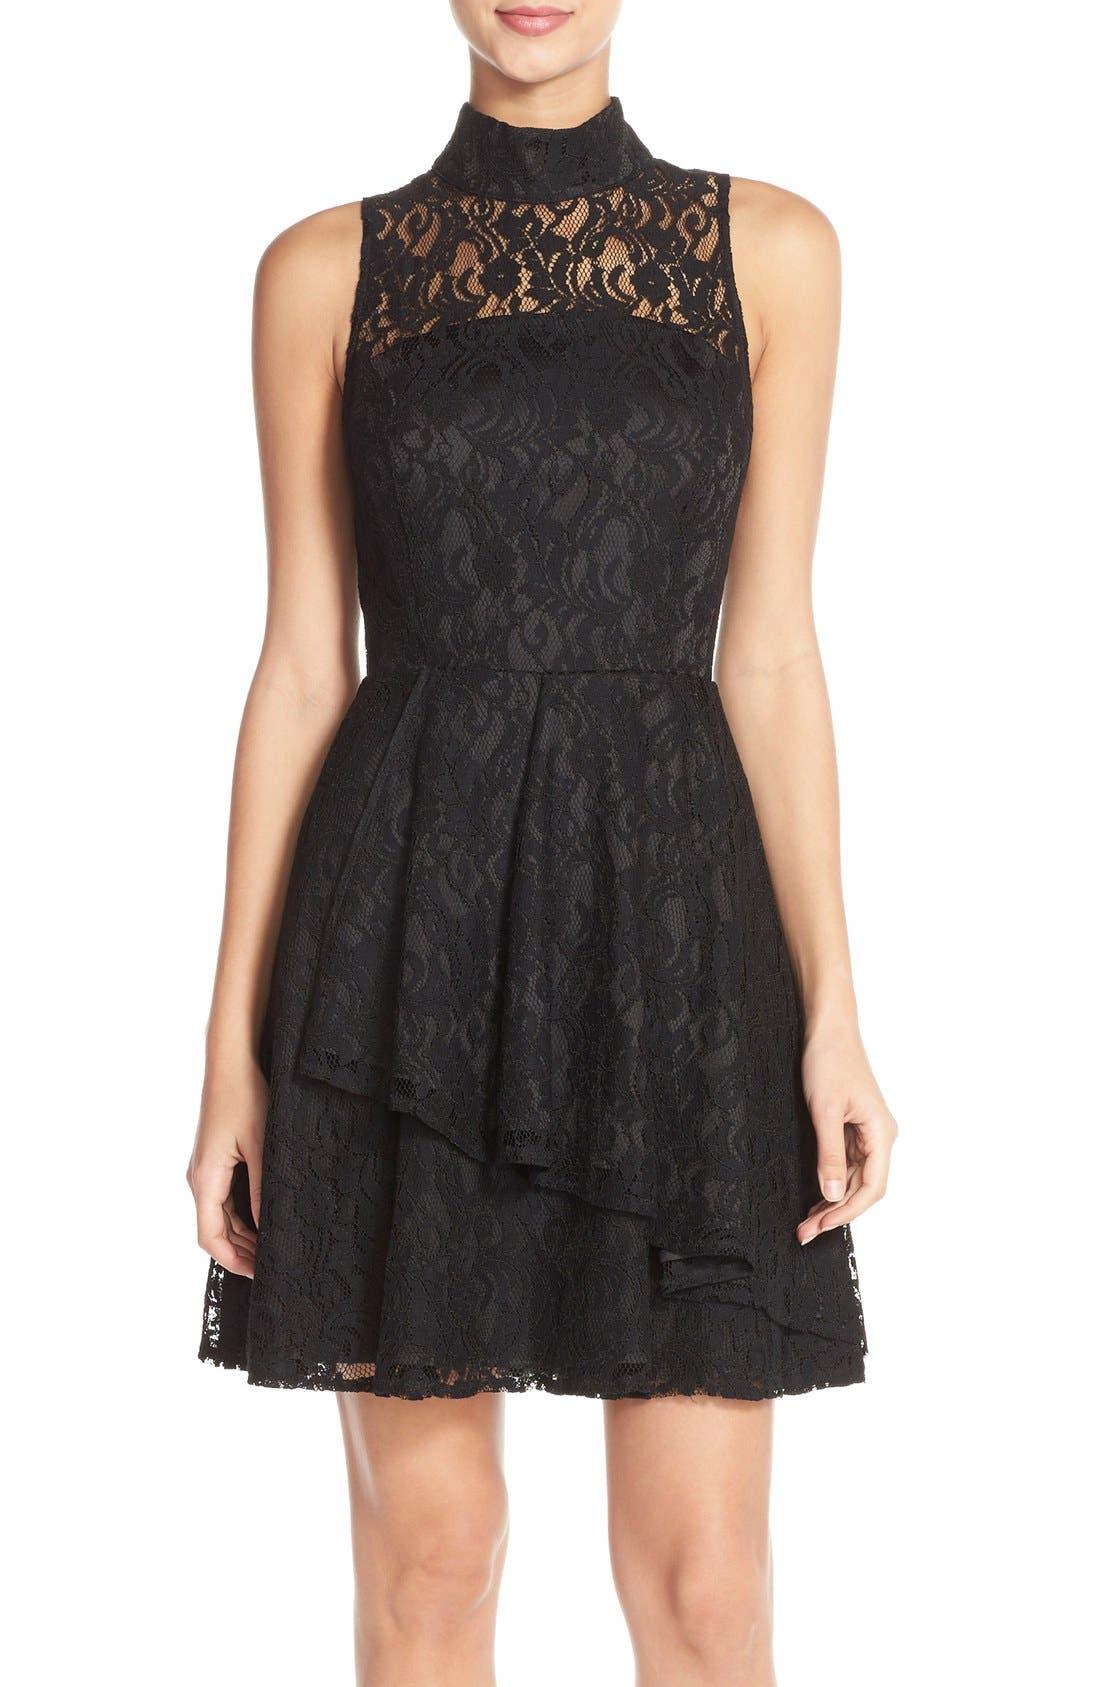 Alternate Image 1 Selected - Adelyn Rae Mock Neck Lace Fit & Flare Dress